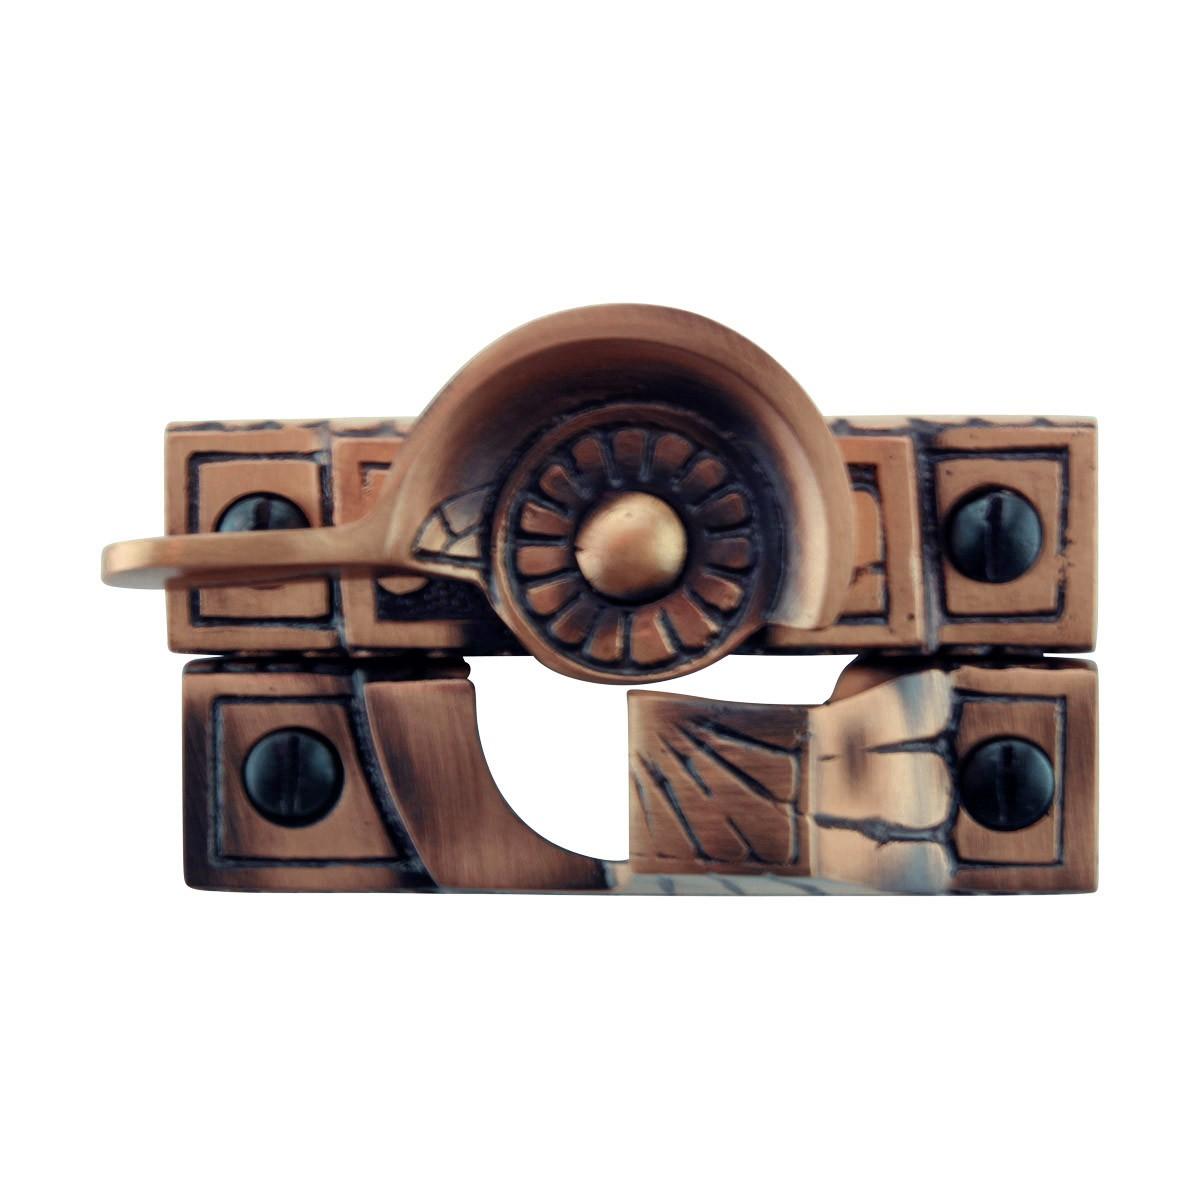 8 Ornate Solid Brass Window Sash Lock Antique Brass Window Pulls Window Lifts Sash Lift